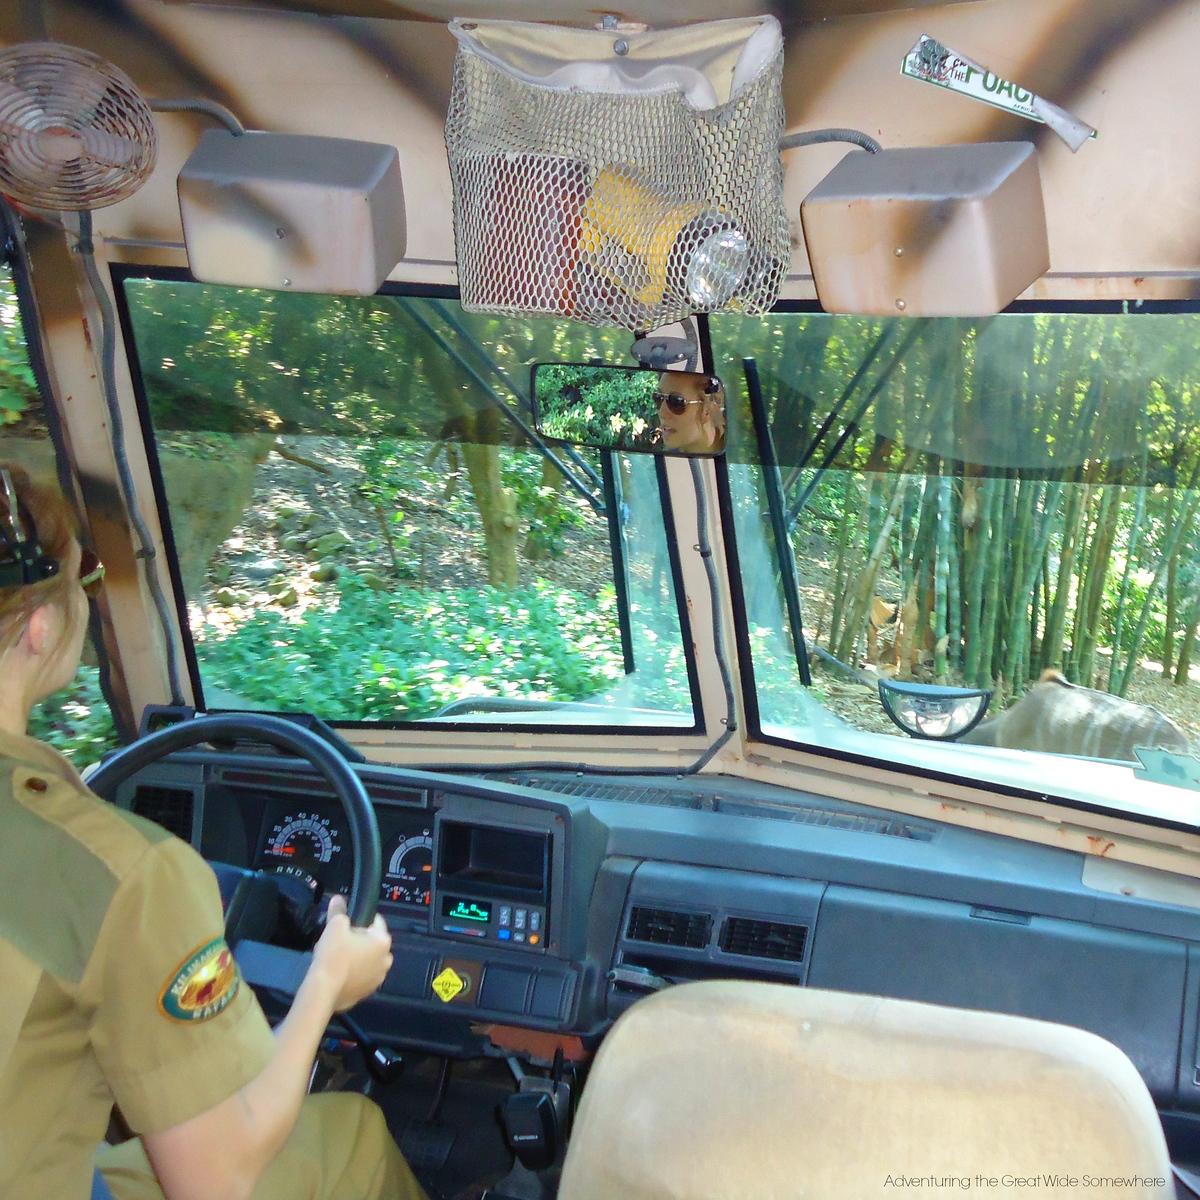 Behind the Wheel of Kilimajaro Safaris at Disney's Animal Kingdom